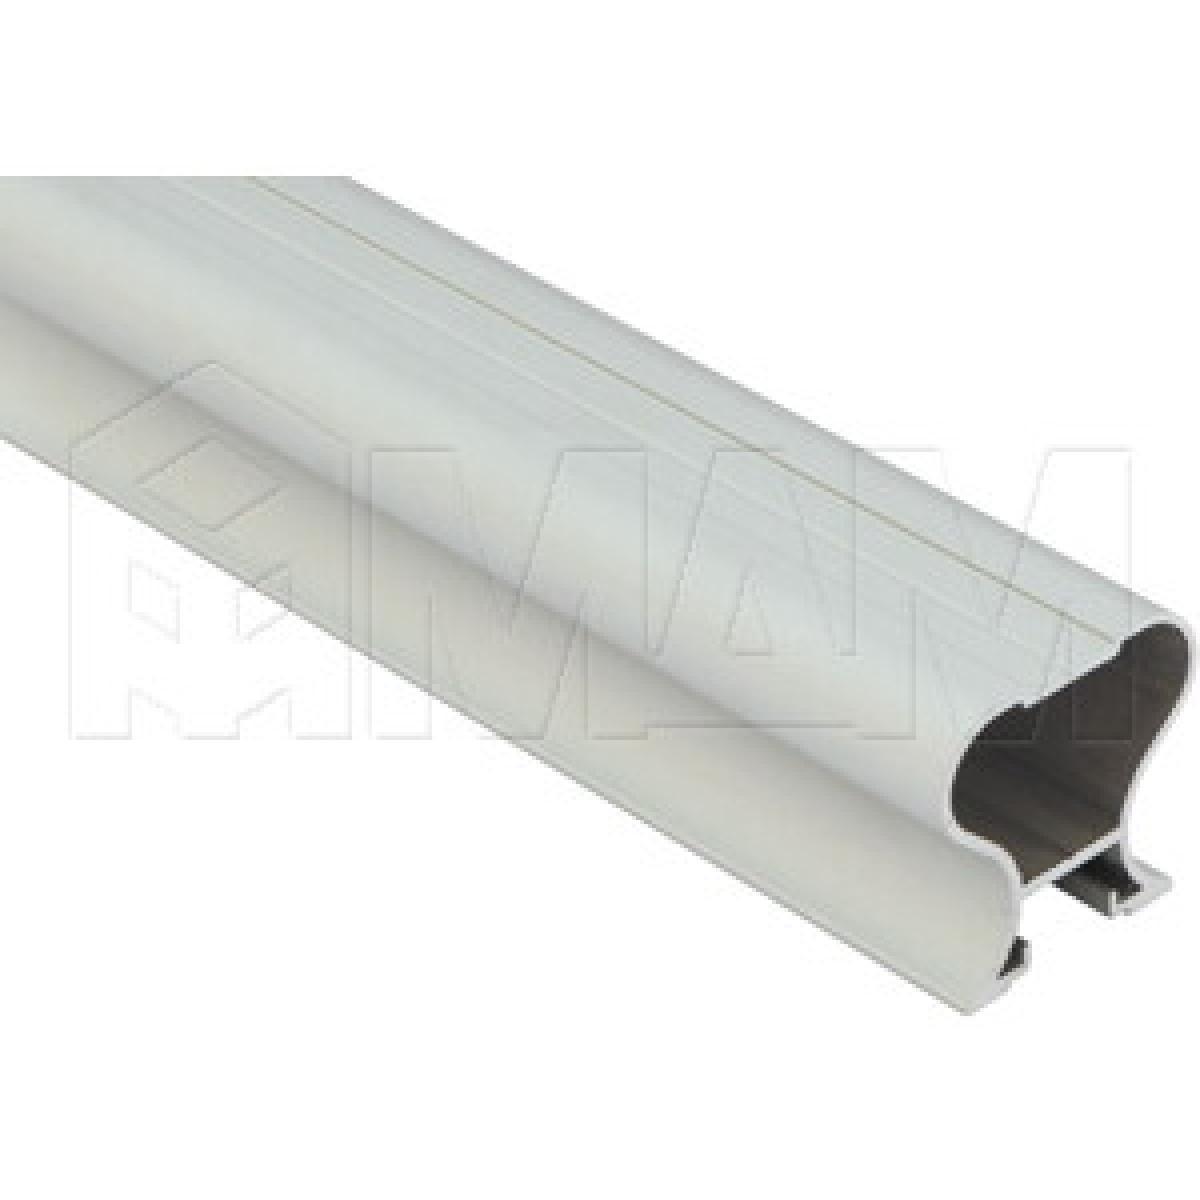 INTEGRO Профиль-ручка симм. серебро, L-5400